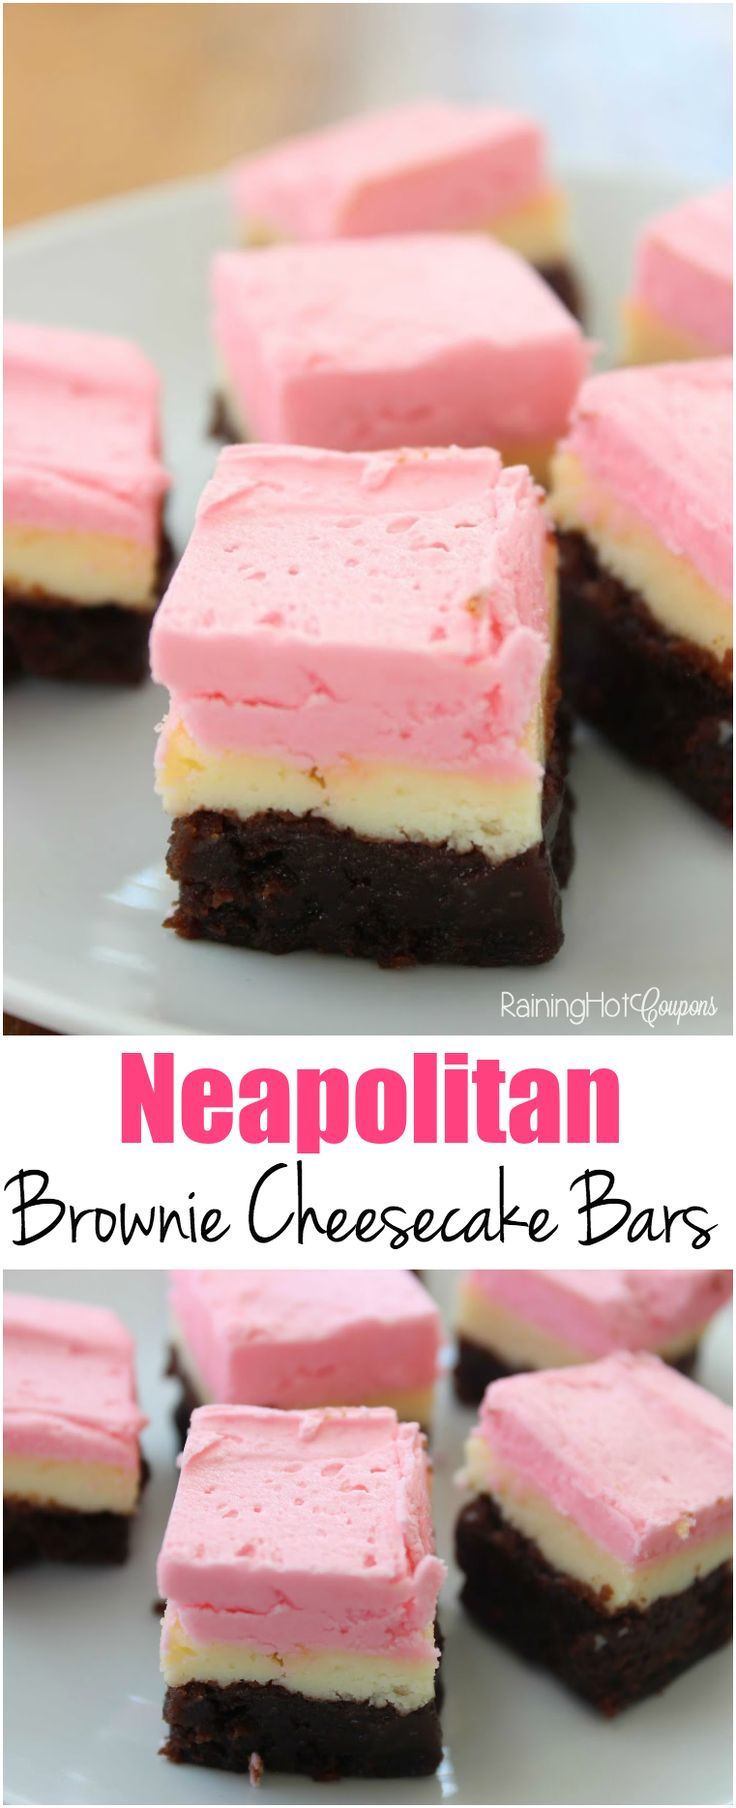 Neapolitan Look Brownie Cheesecake Bars Brownie cheesecake